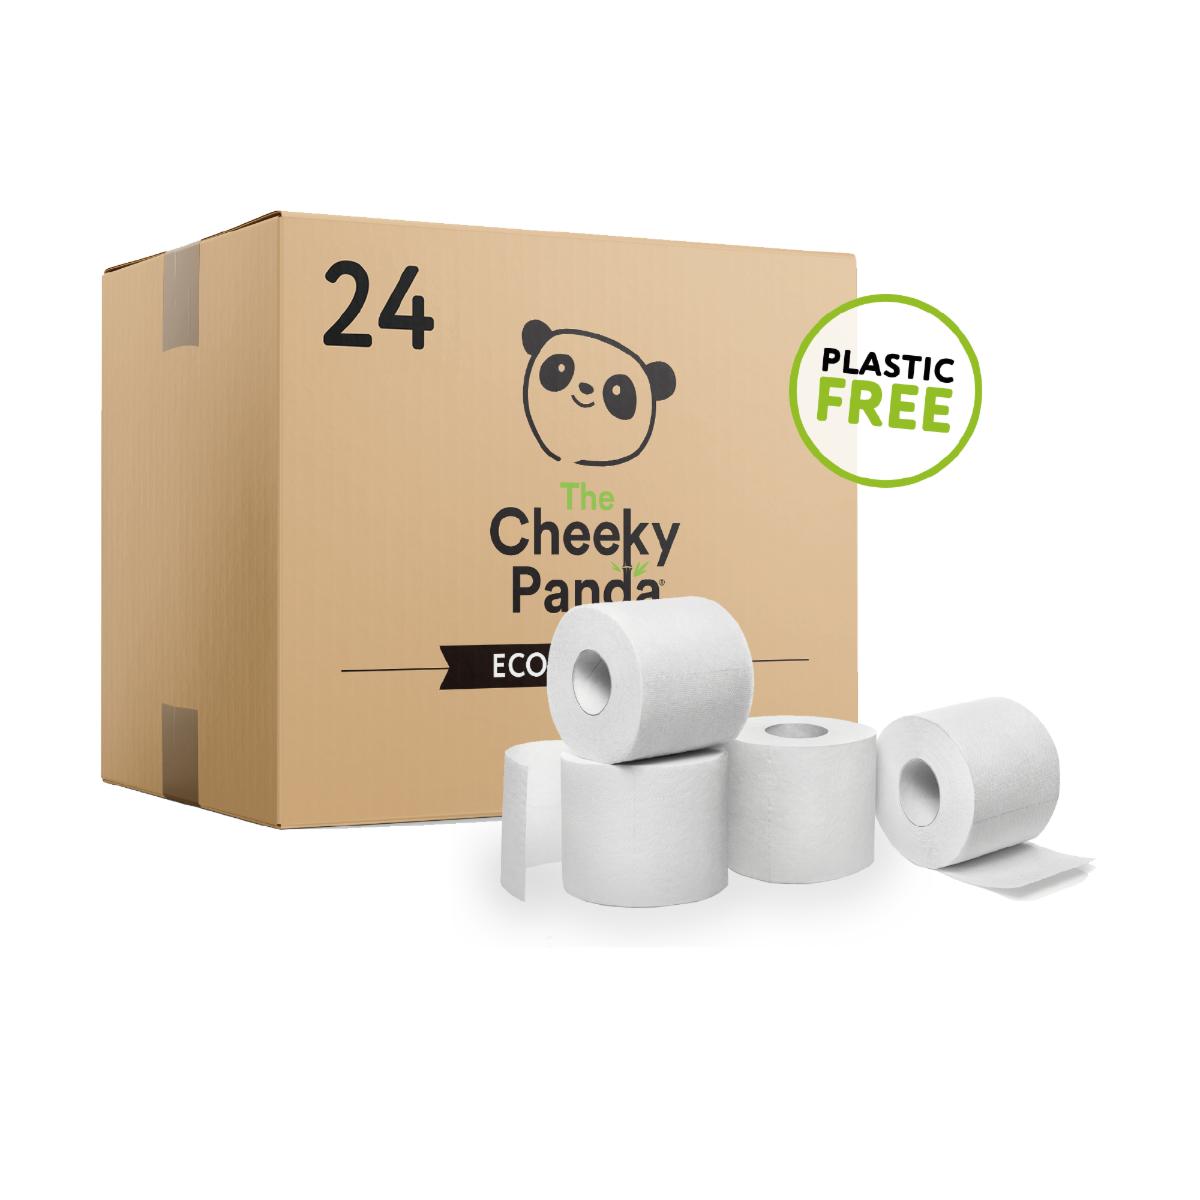 The Cheeky Panda Plastic Free 3 Ply Toilet Tissue - 24 Rolls